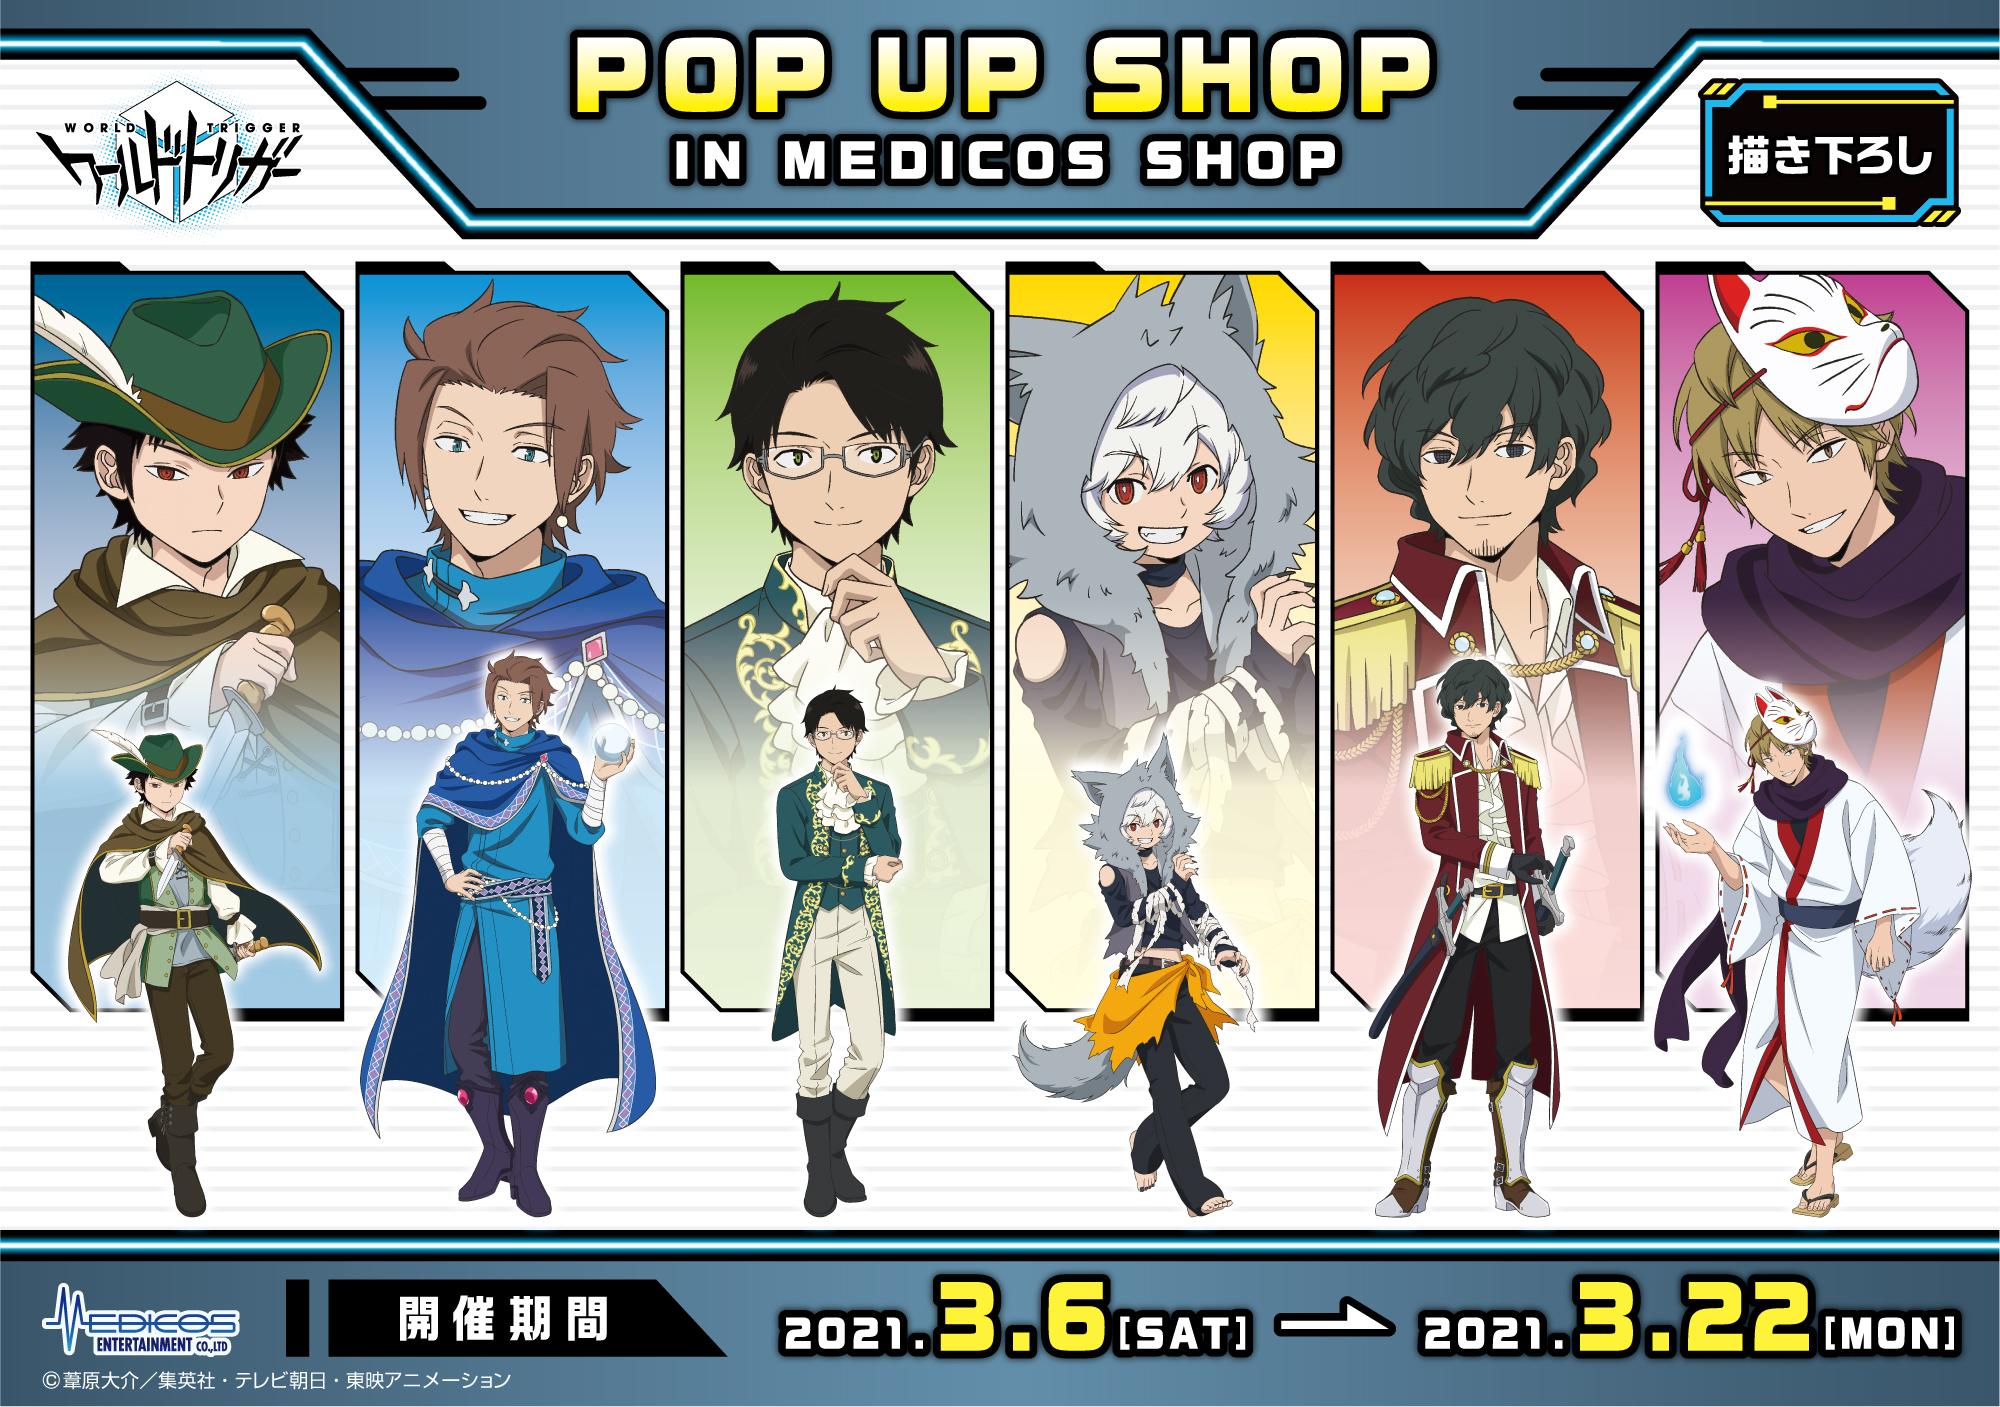 TVアニメ「ワールドトリガー」POP UP SHOPが開催決定!描き下ろしイラストを使用したグッズ&パネルが登場